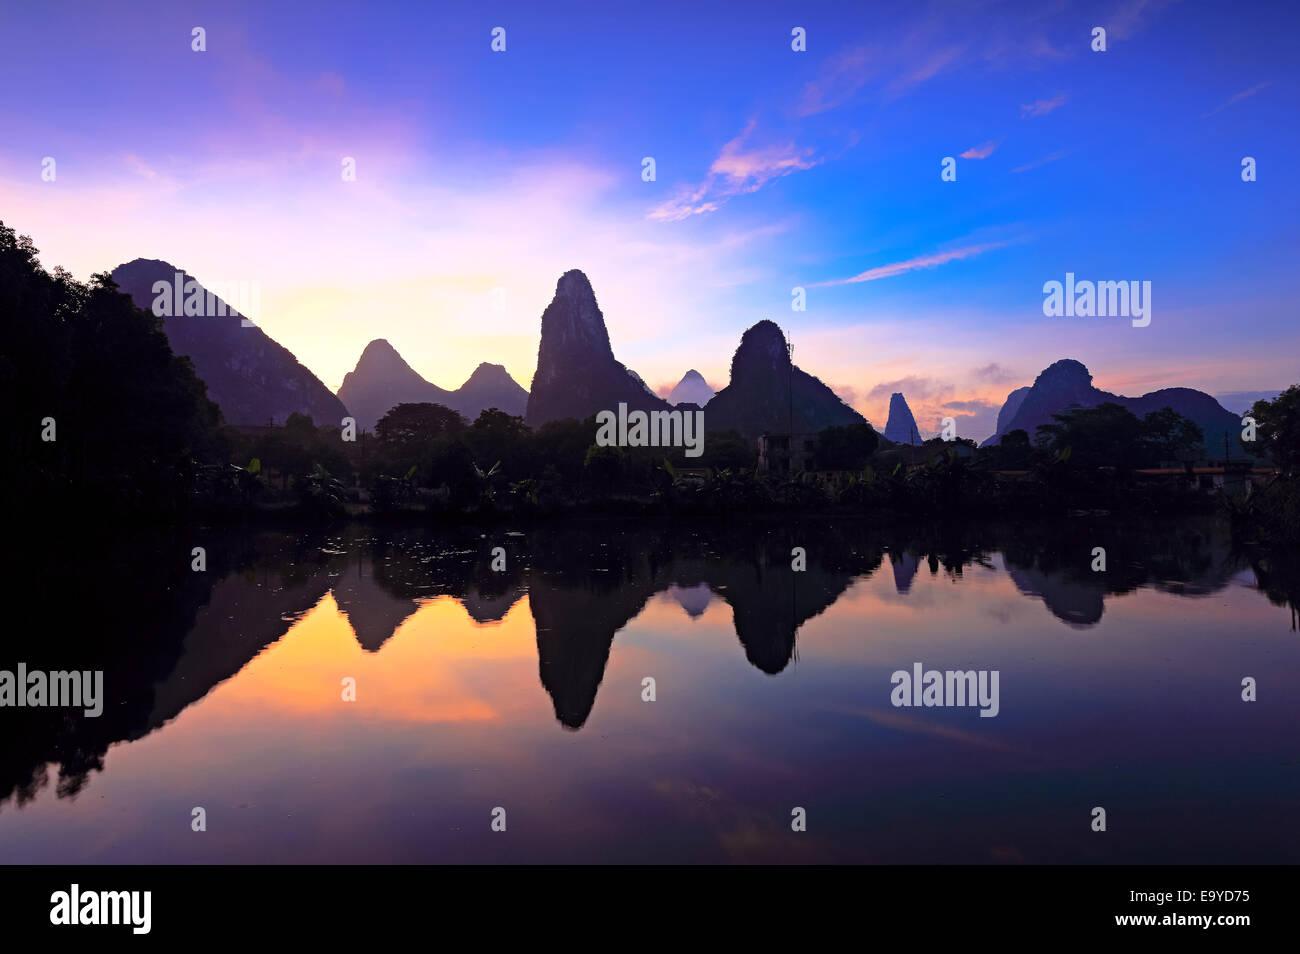 Los paisajes de Guilin Imagen De Stock